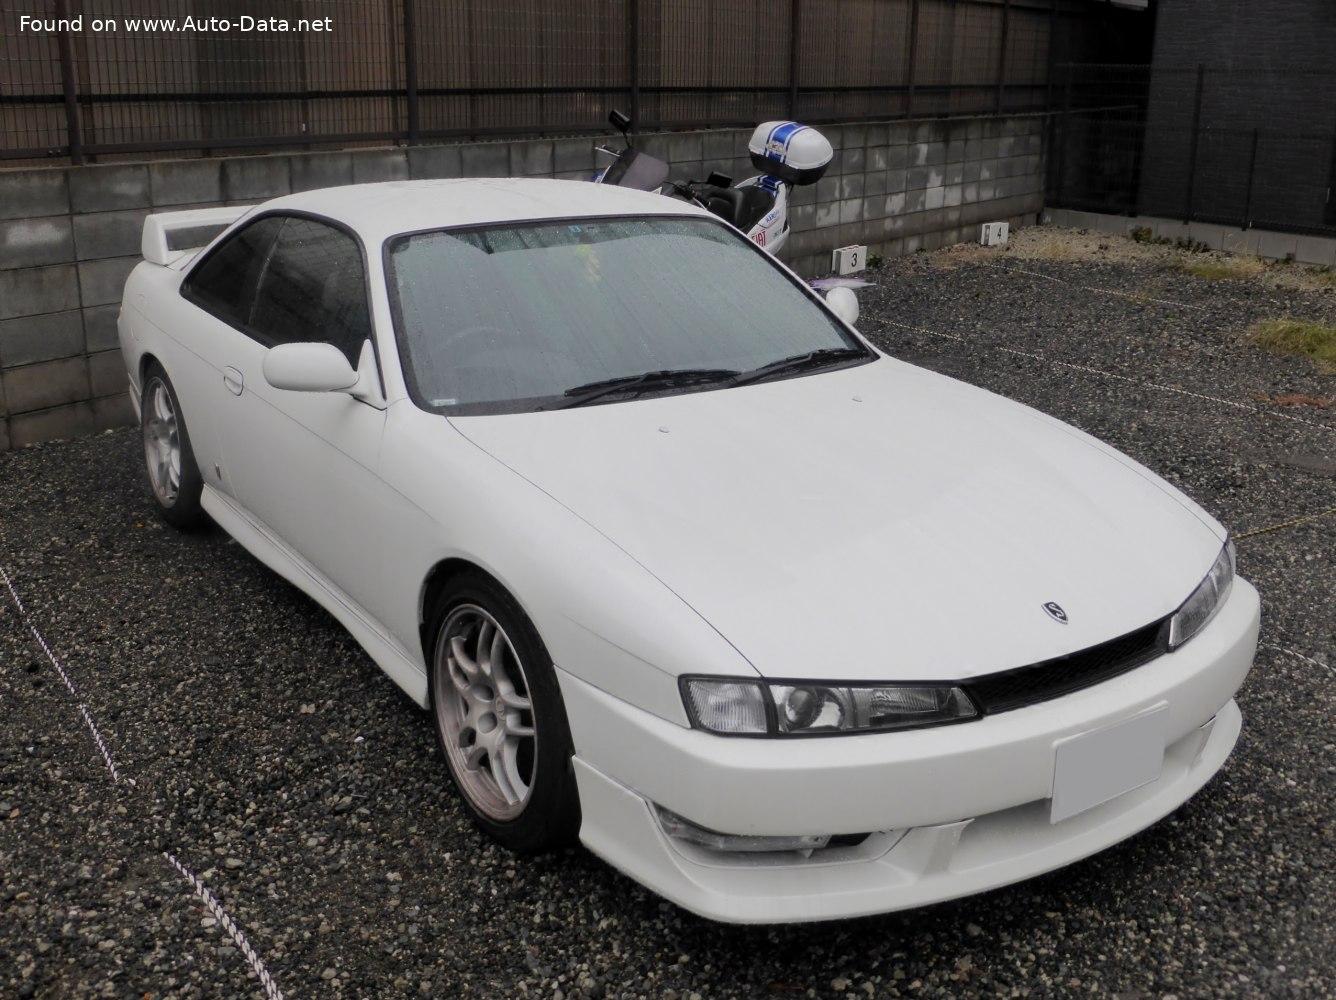 1993 Nissan Silvia S14 2 0 I 16v Turbo 200 Hp Technical Specs Data Fuel Consumption Dimensions